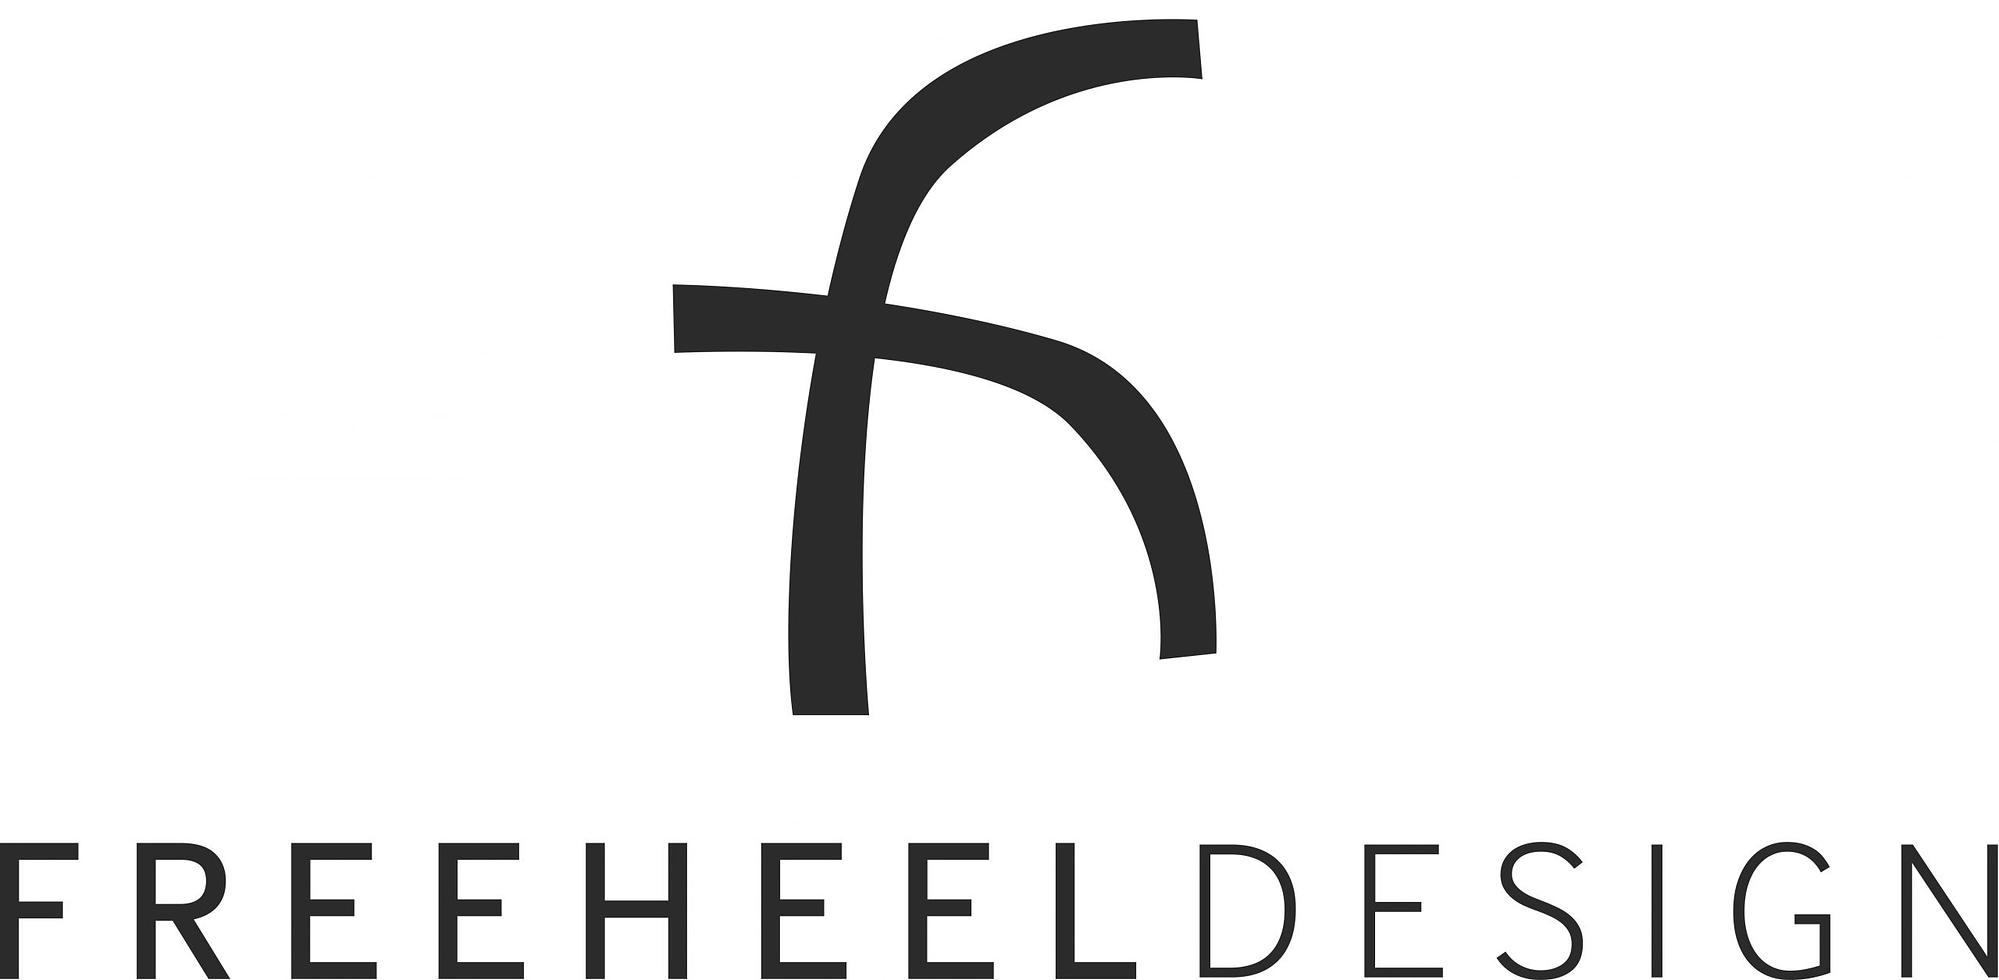 Freeheel design